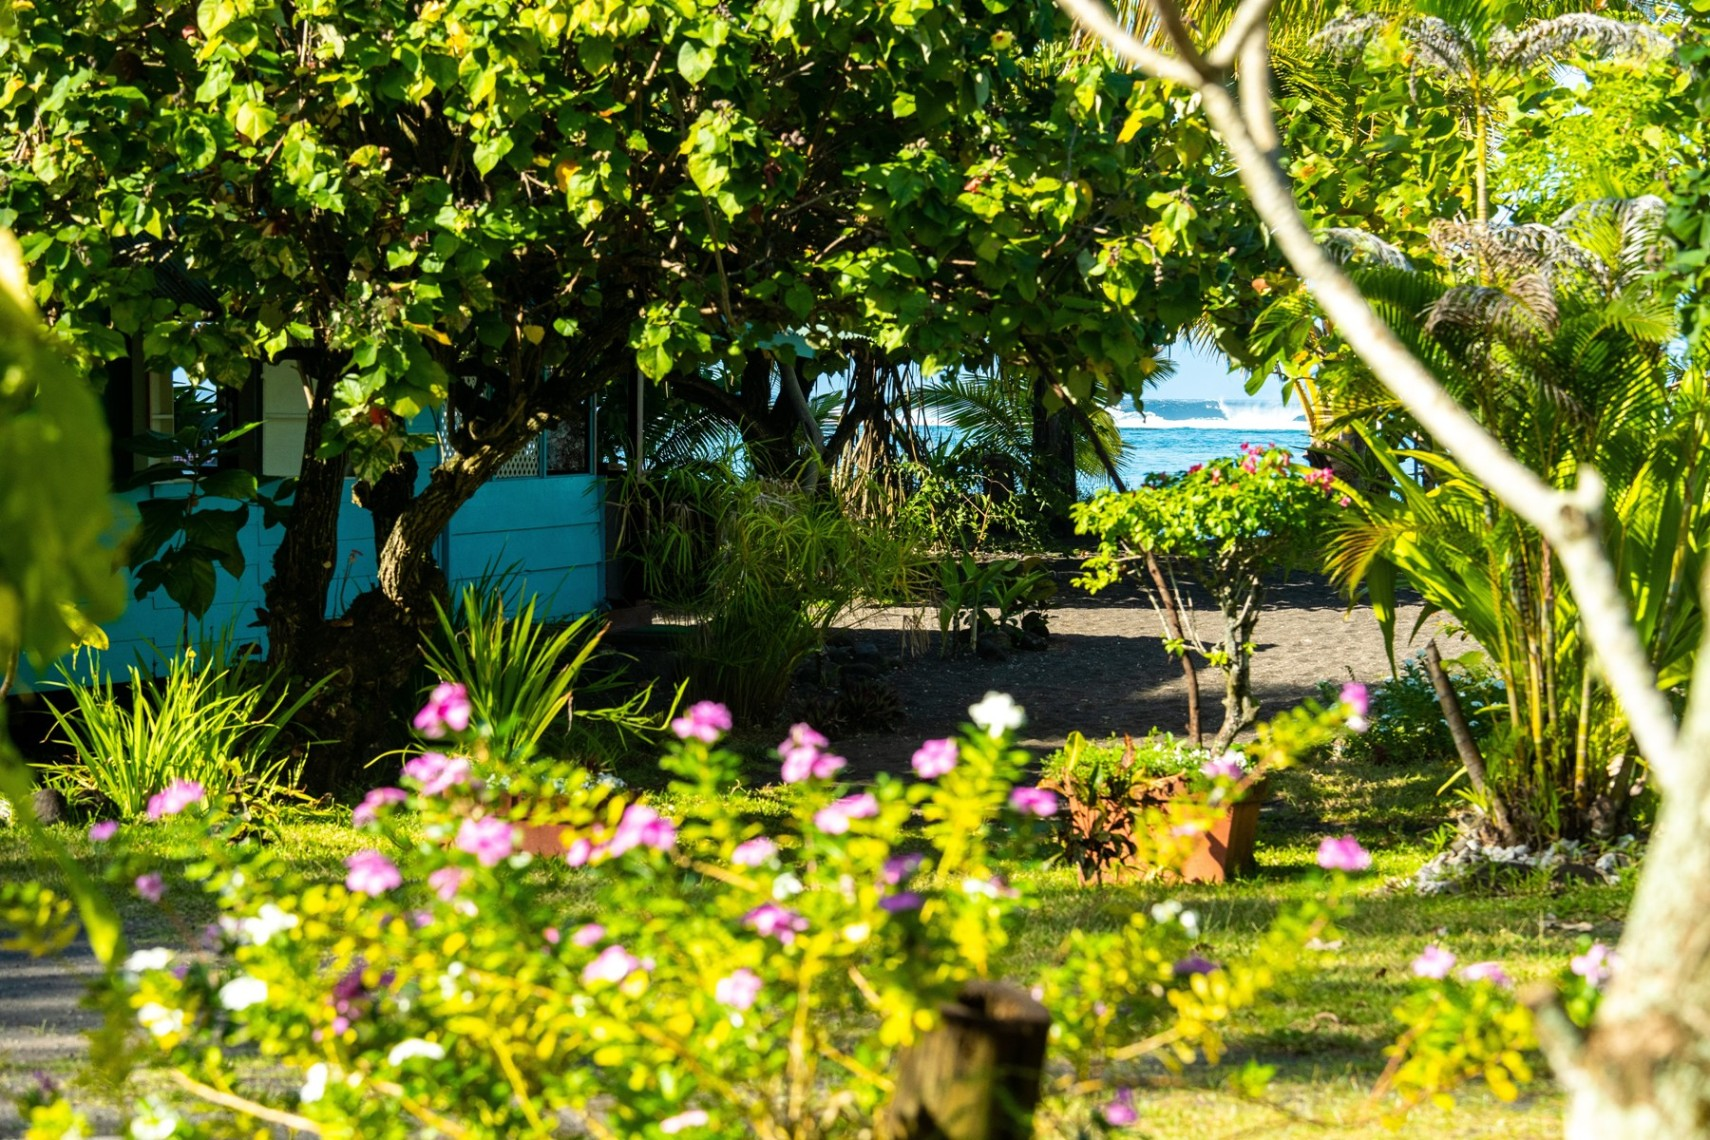 https://tahititourisme.uk/wp-content/uploads/2019/08/copie-tahiti-tourisme-800ko-1.jpg